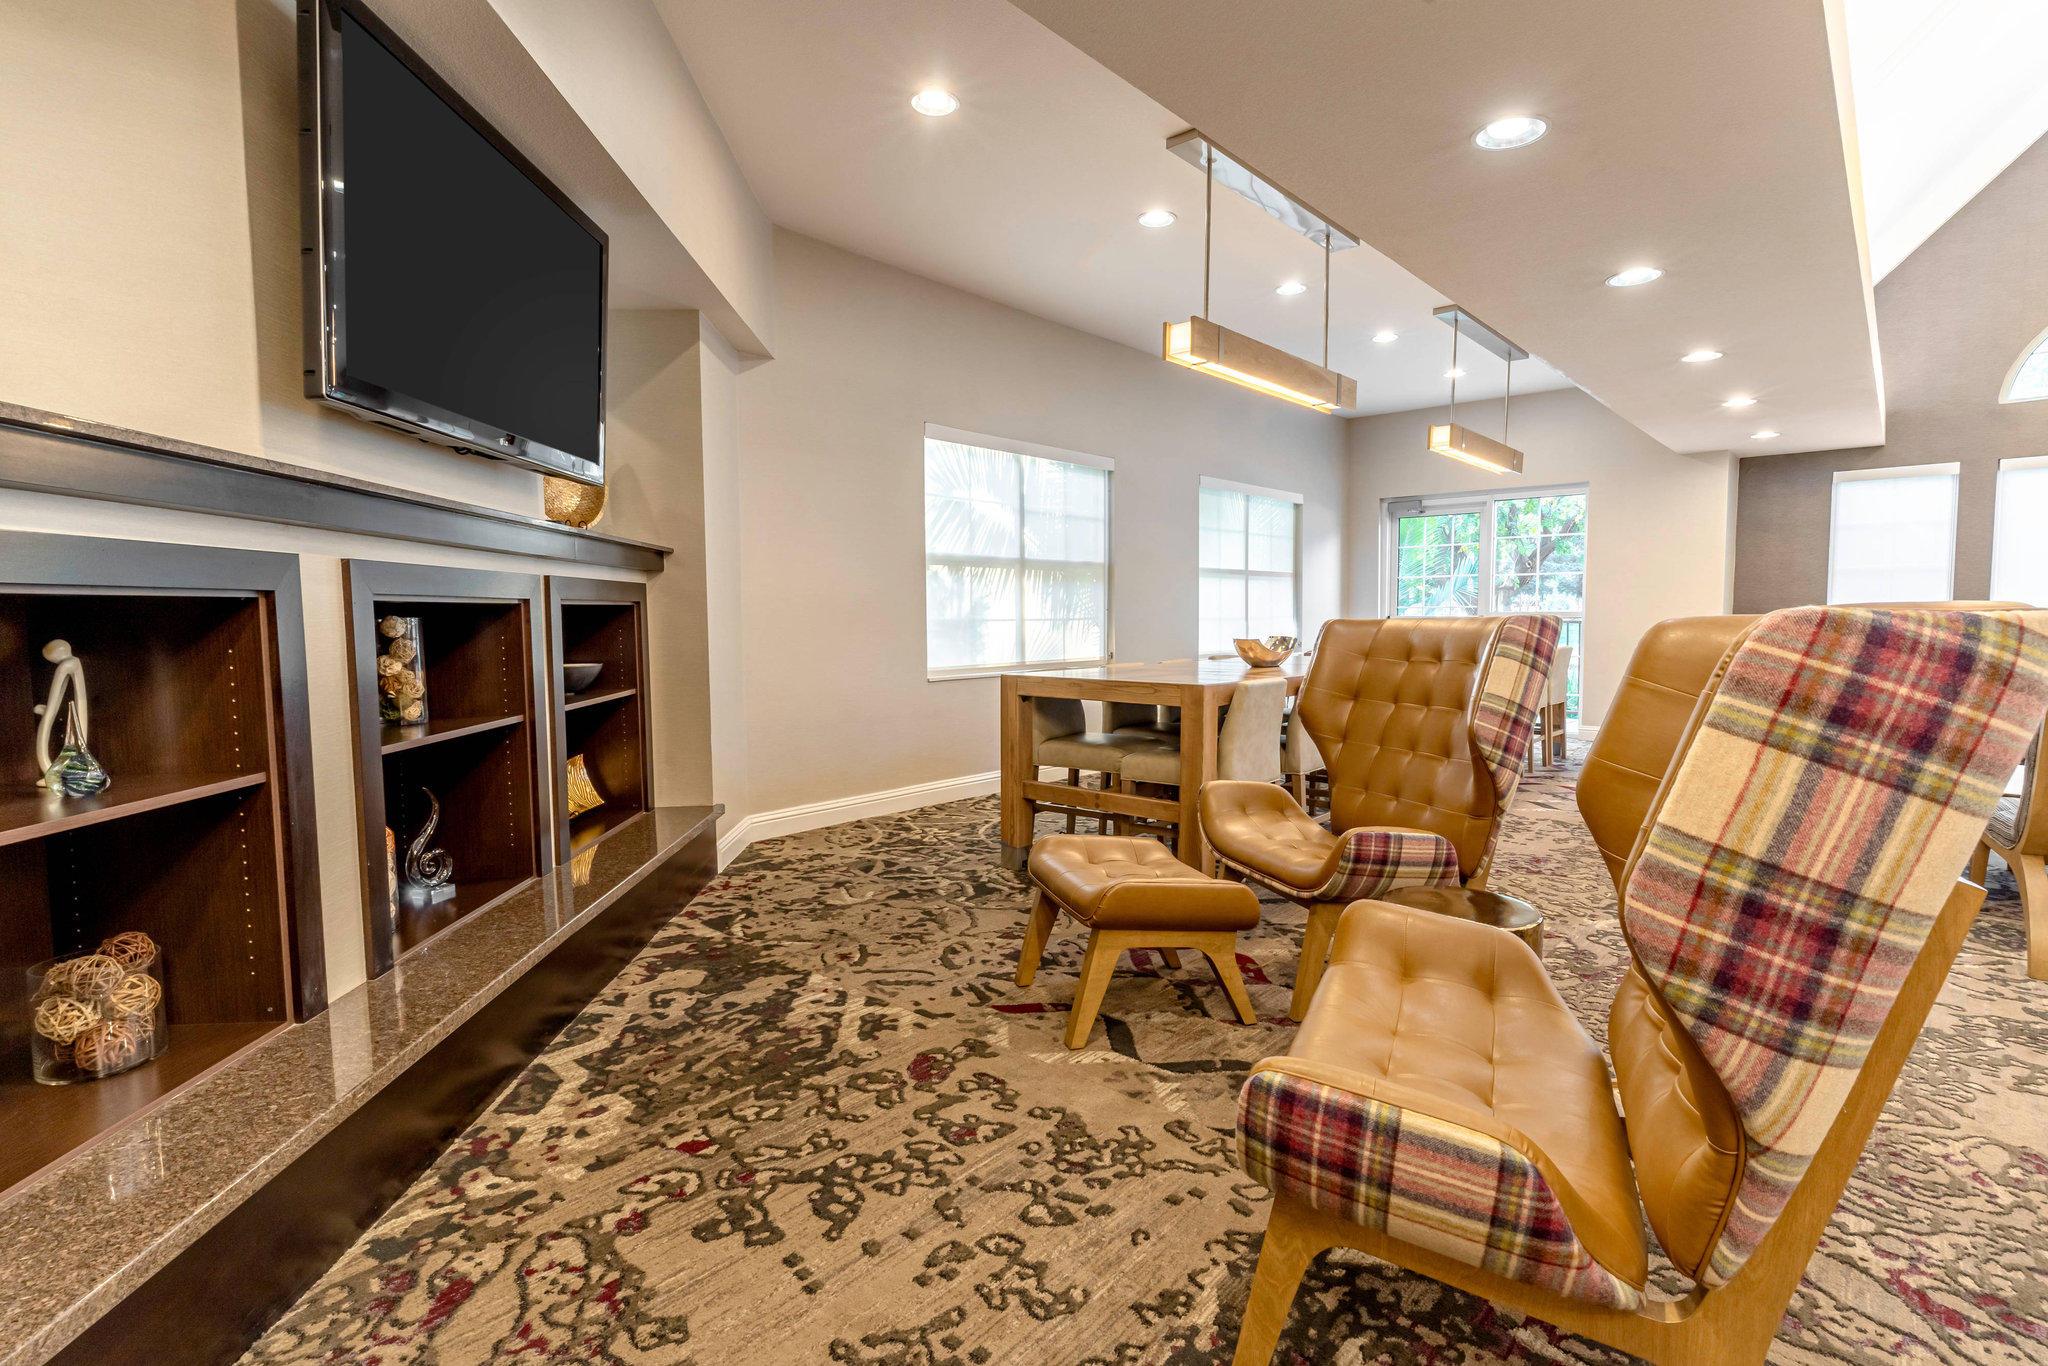 Residence Inn by Marriott Sacramento Rancho Cordova